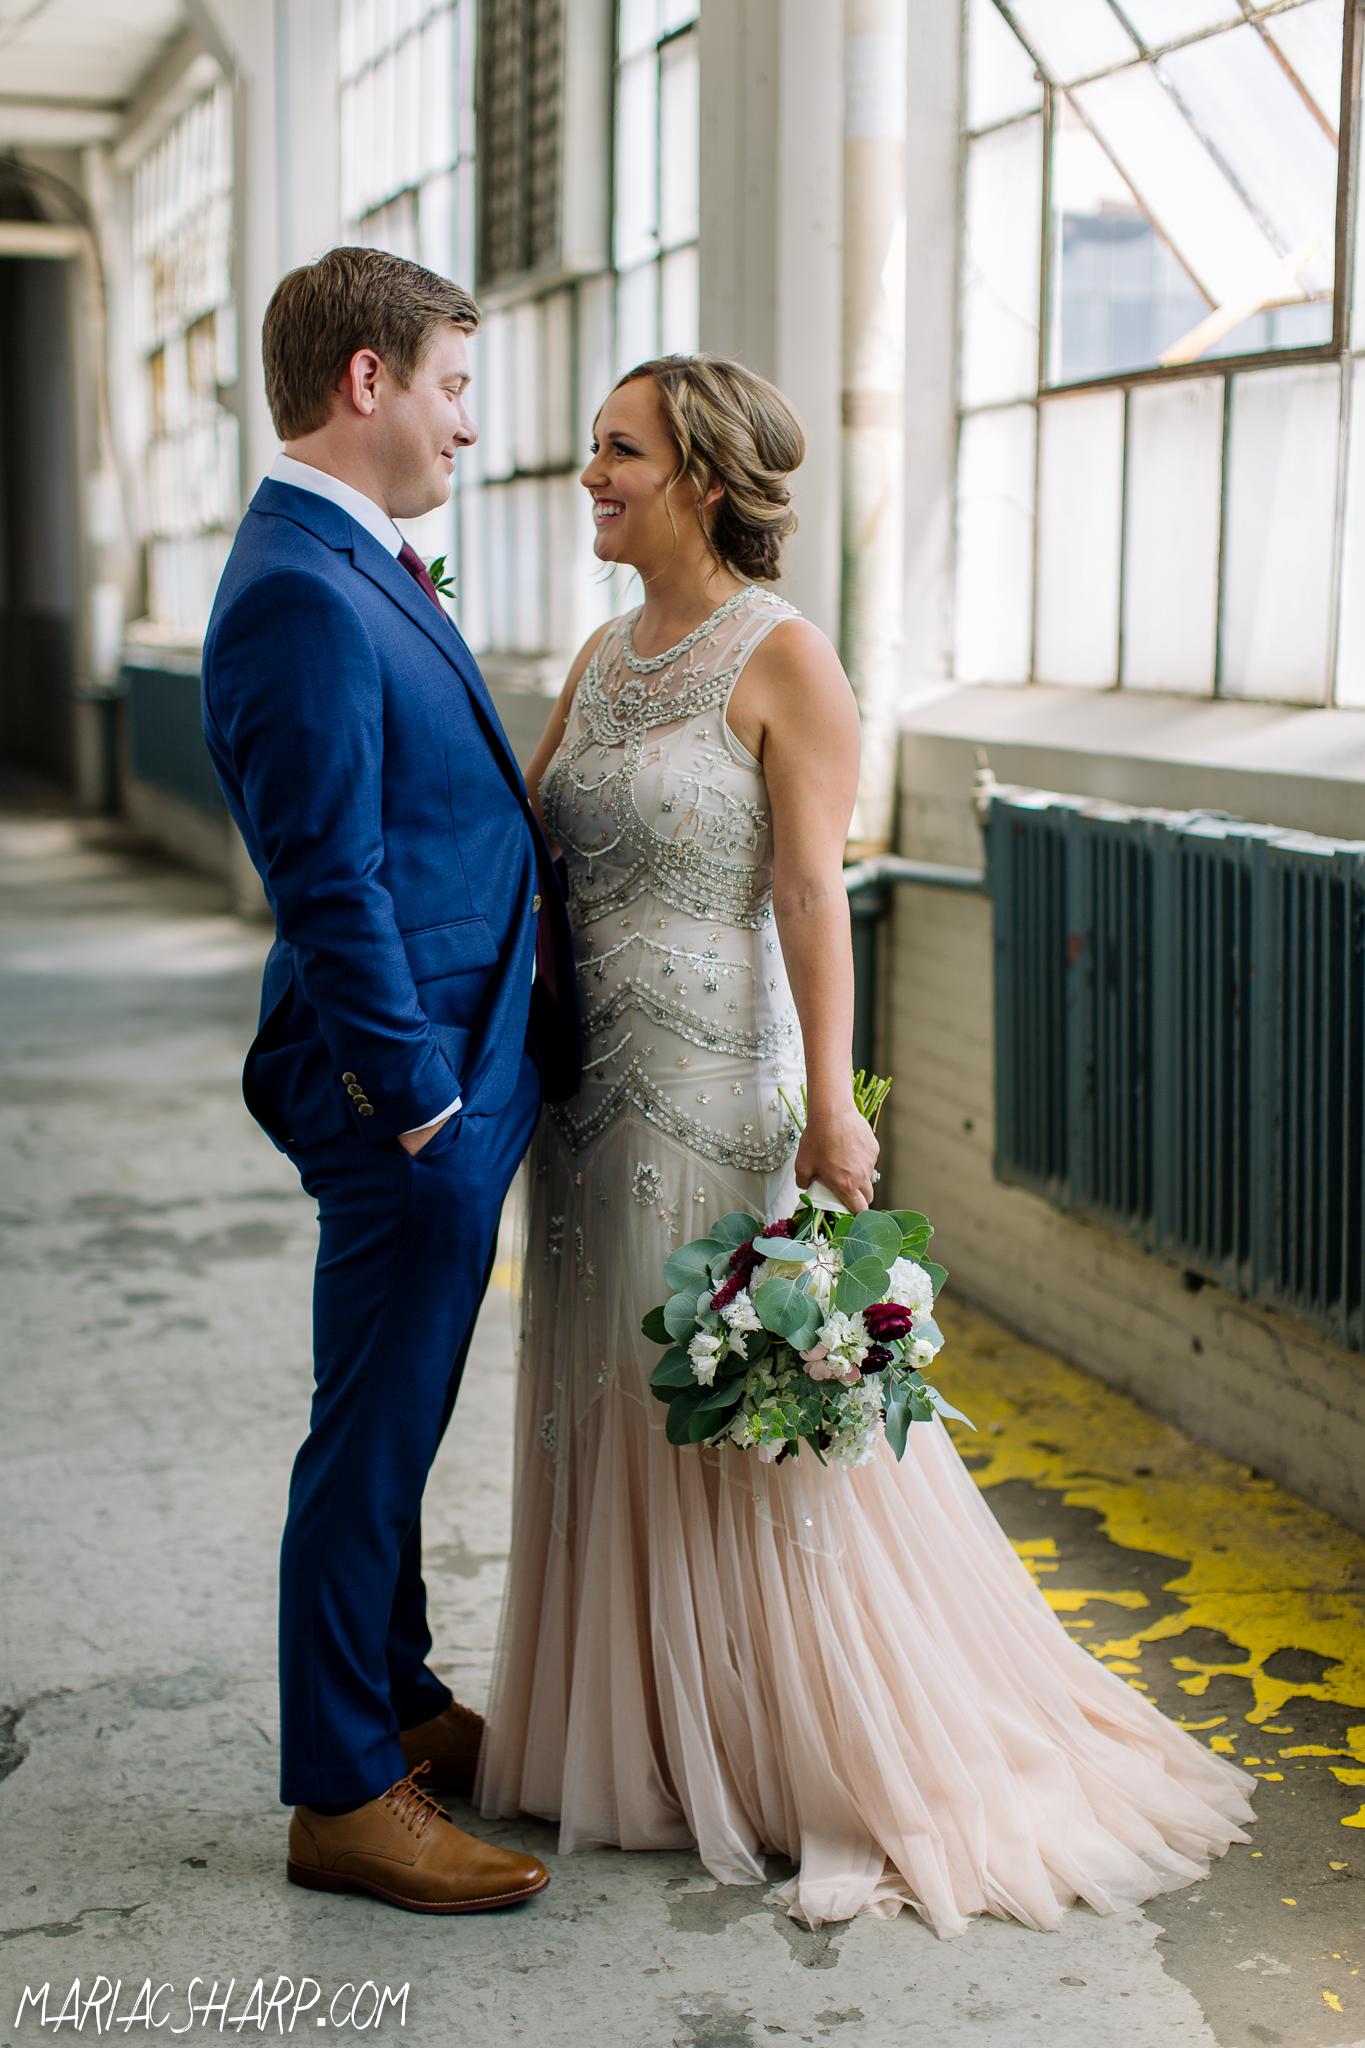 Cassie-Larson-Matt-Seccombe-wedding-20170715-100.jpg